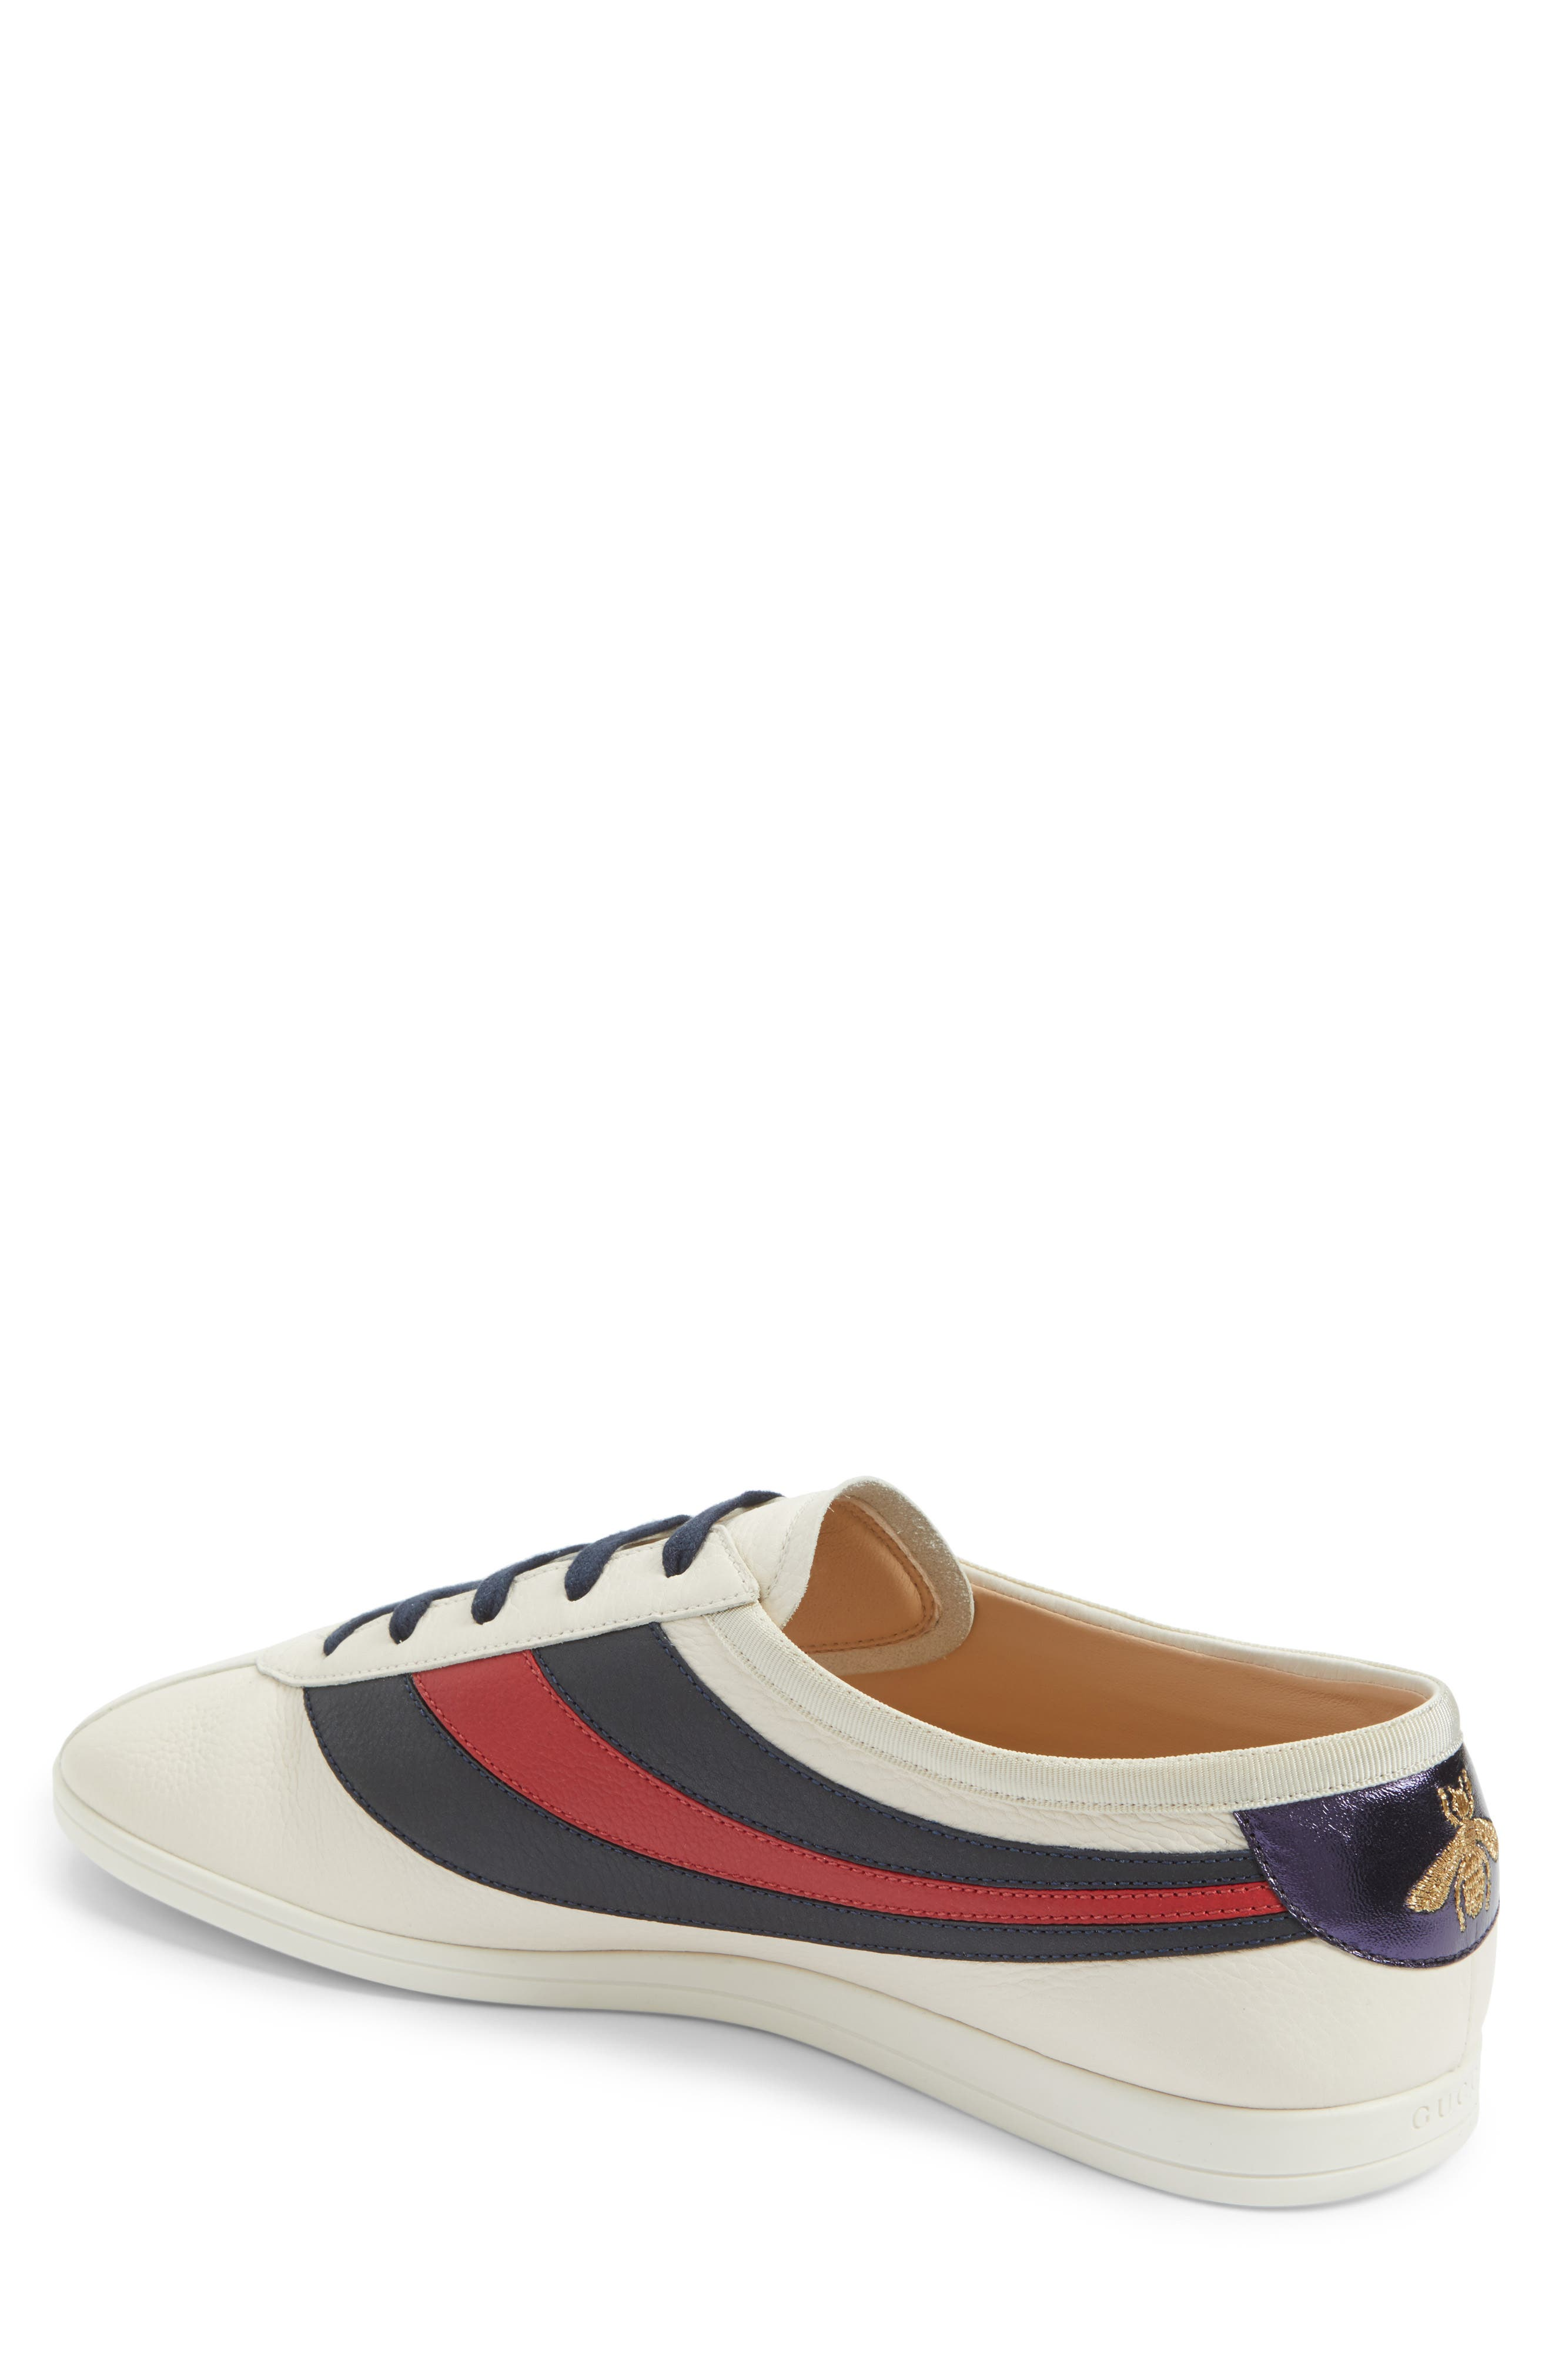 Falacer Sneaker,                             Alternate thumbnail 2, color,                             White